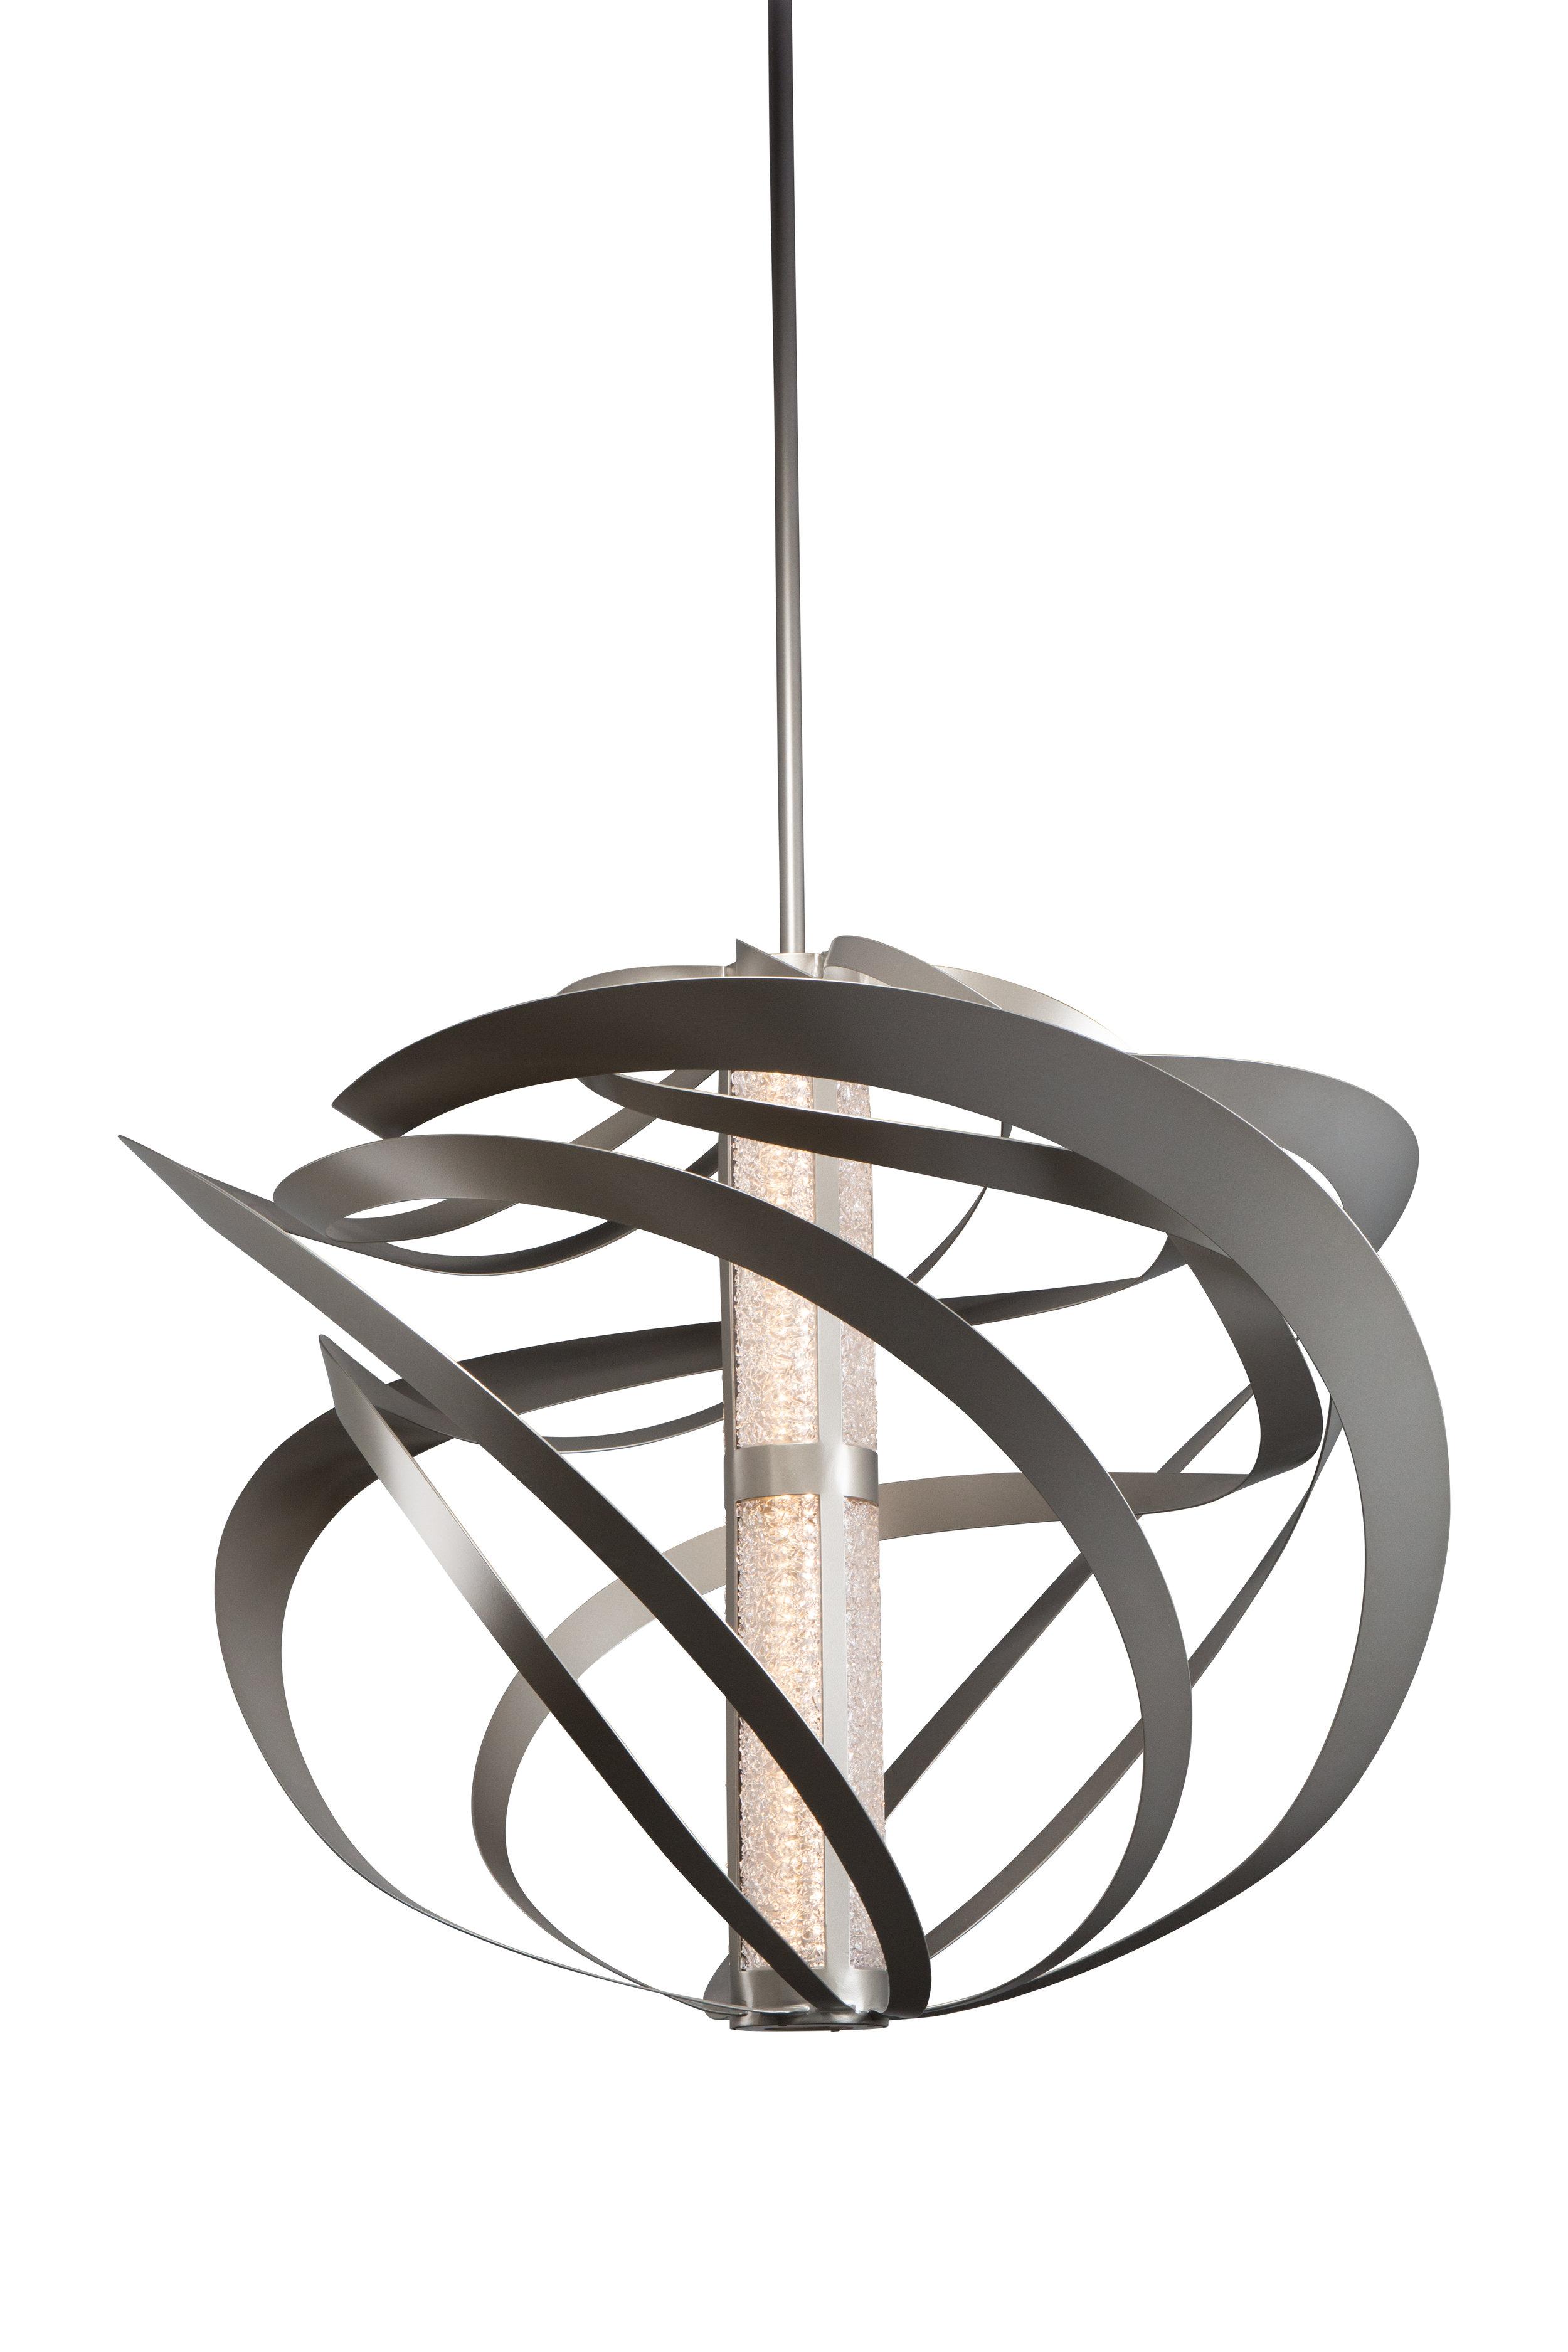 "A 48"" diameter design of LA2115, with a Rimelight glass diffuser. Custom design #CU-LA2115-17A-B"